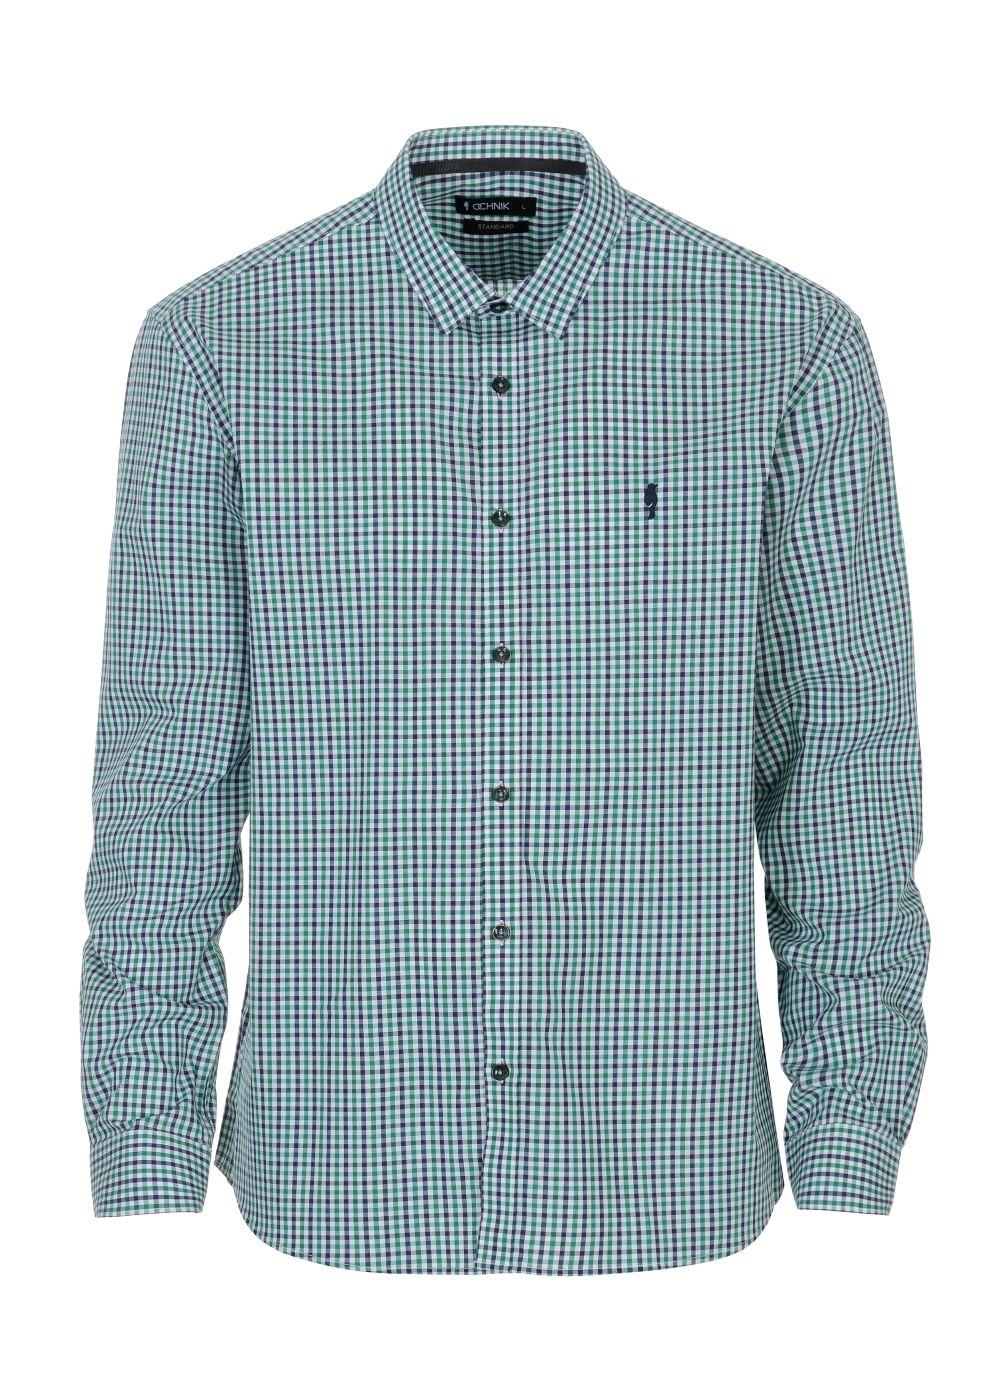 Koszula męska KOSMT-0248-51(W21)